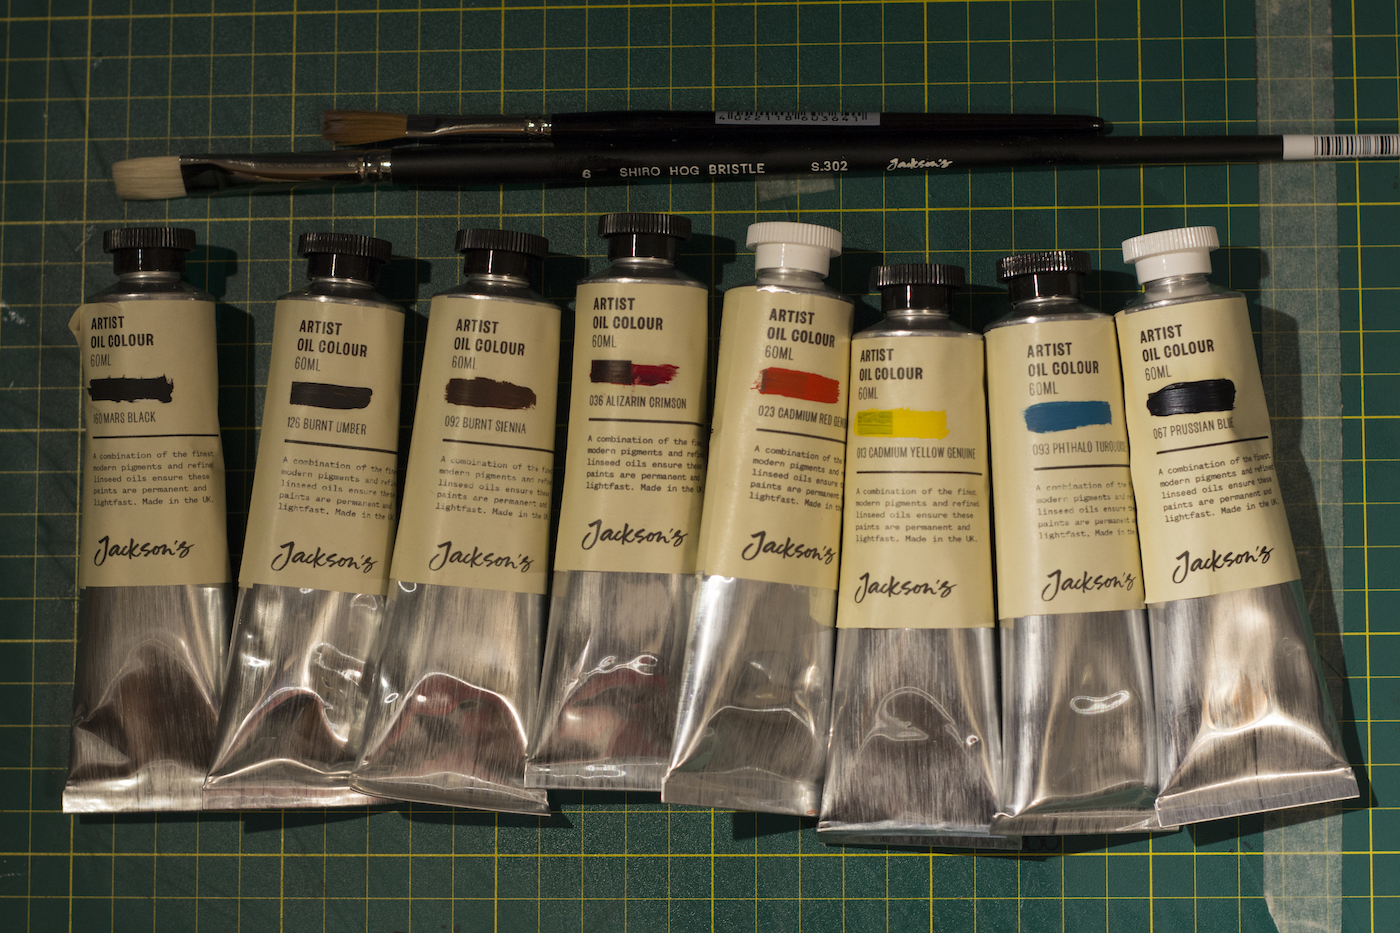 Jackson's Brushes and Artist Oil tubes